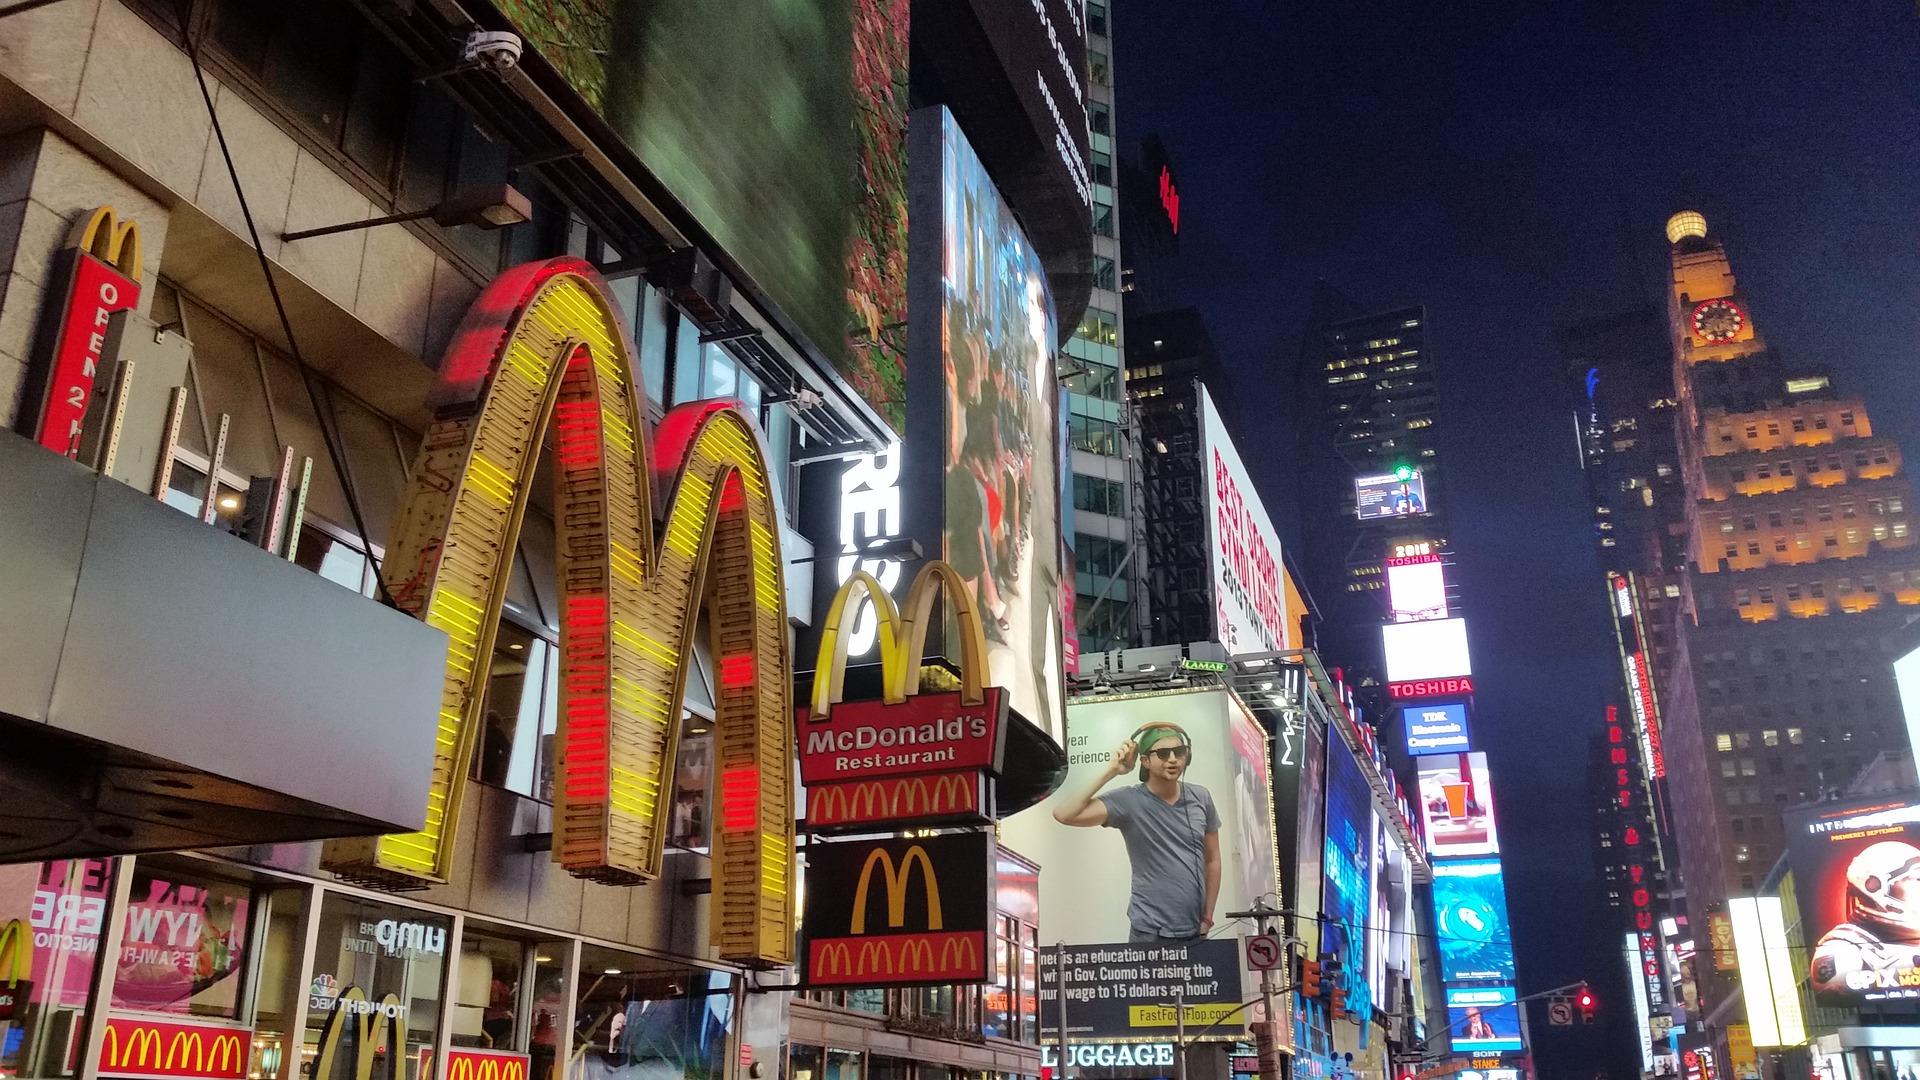 Employees as effective advertising: 2-legged billboards